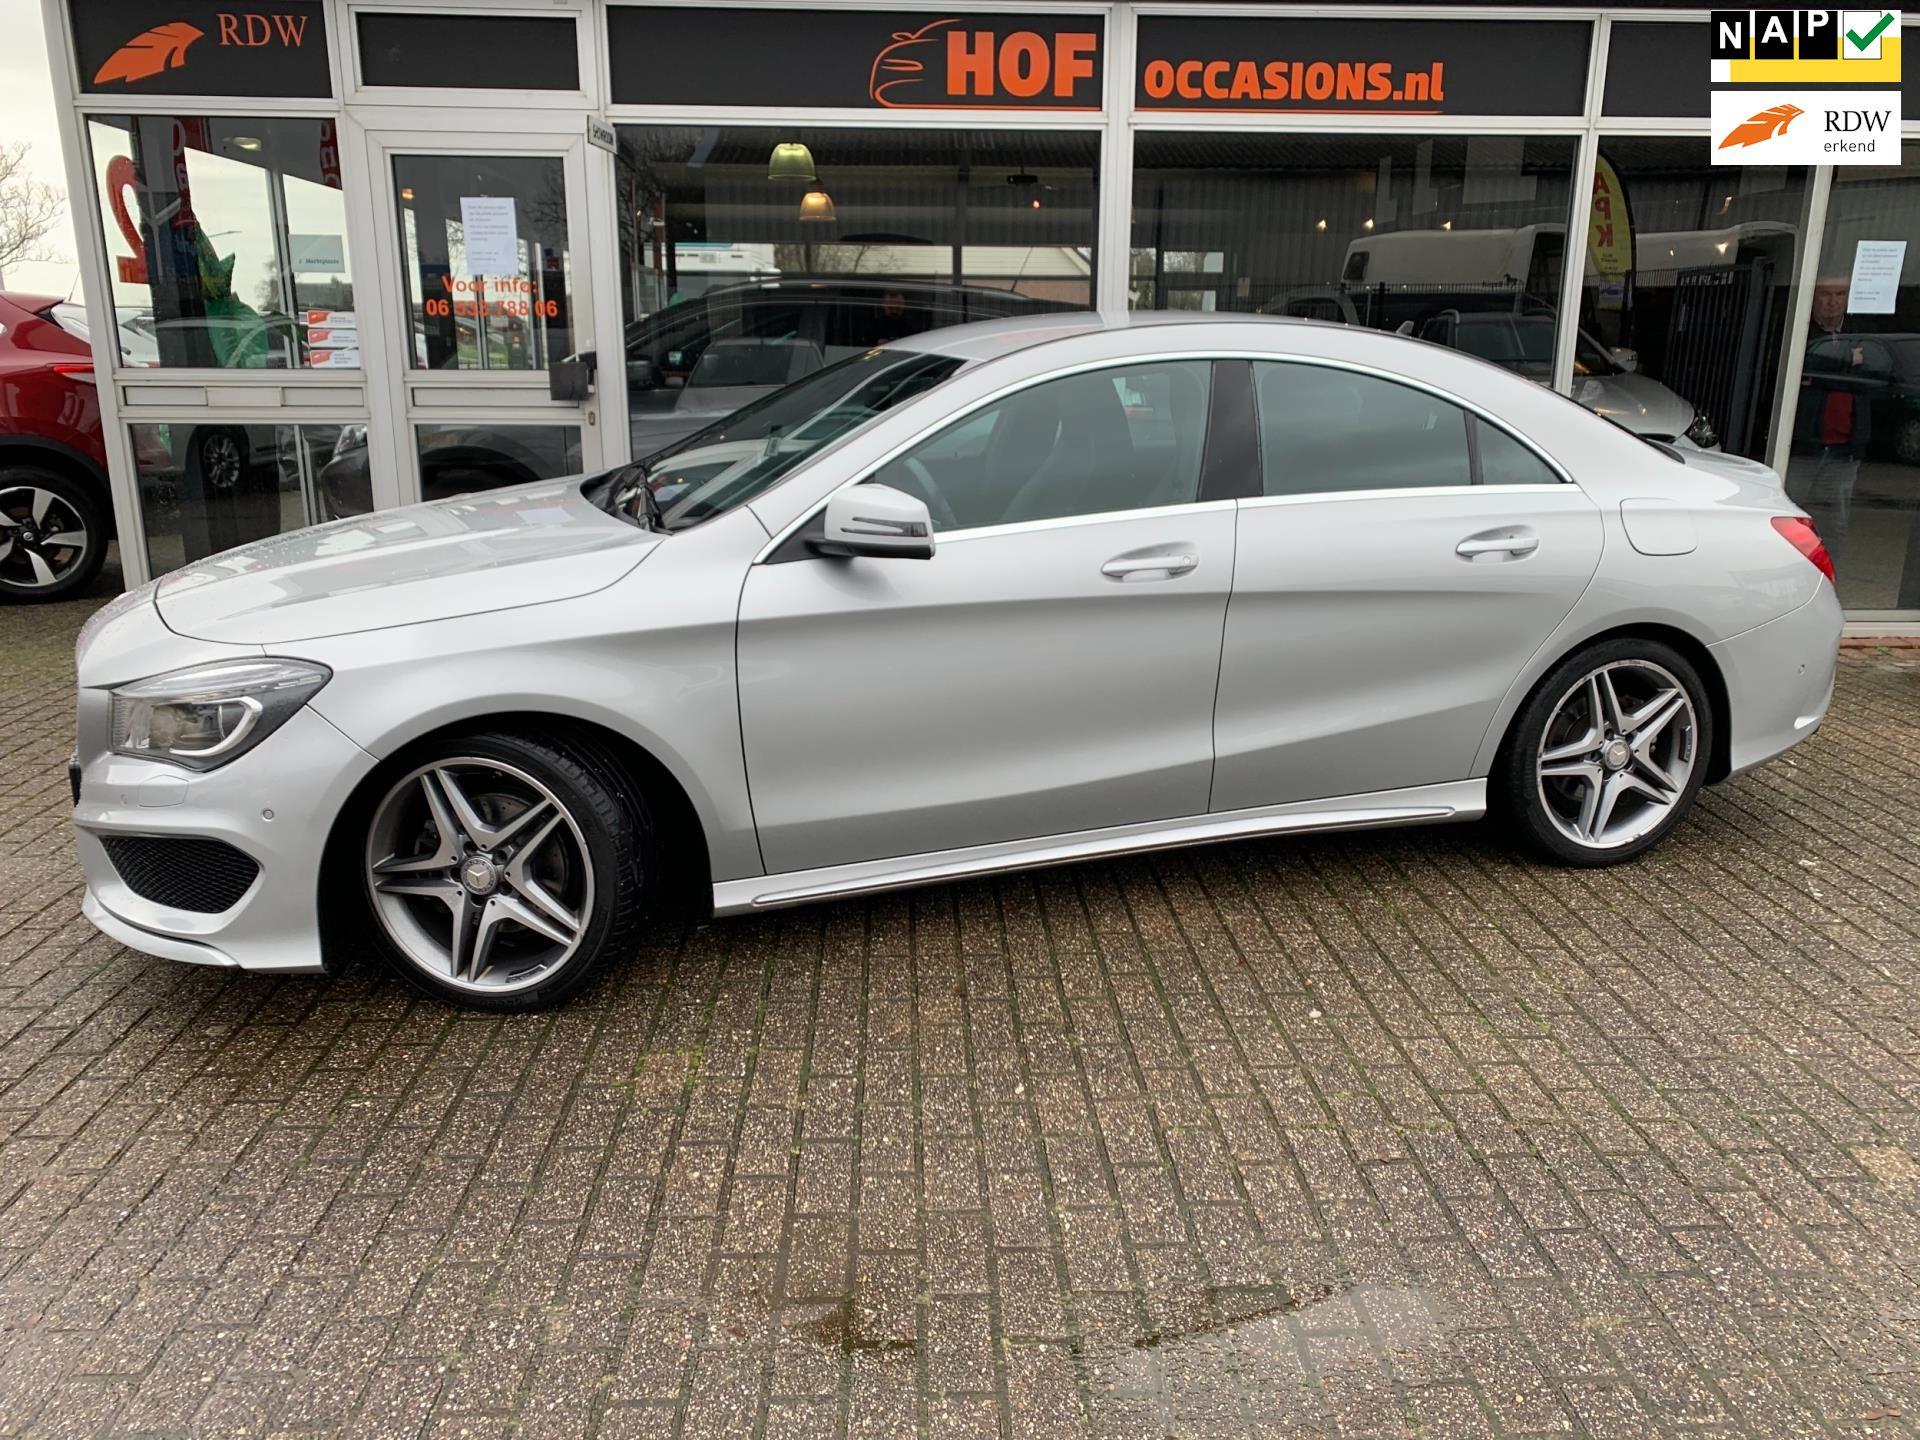 Mercedes-Benz CLA-klasse occasion - Hof Occasions